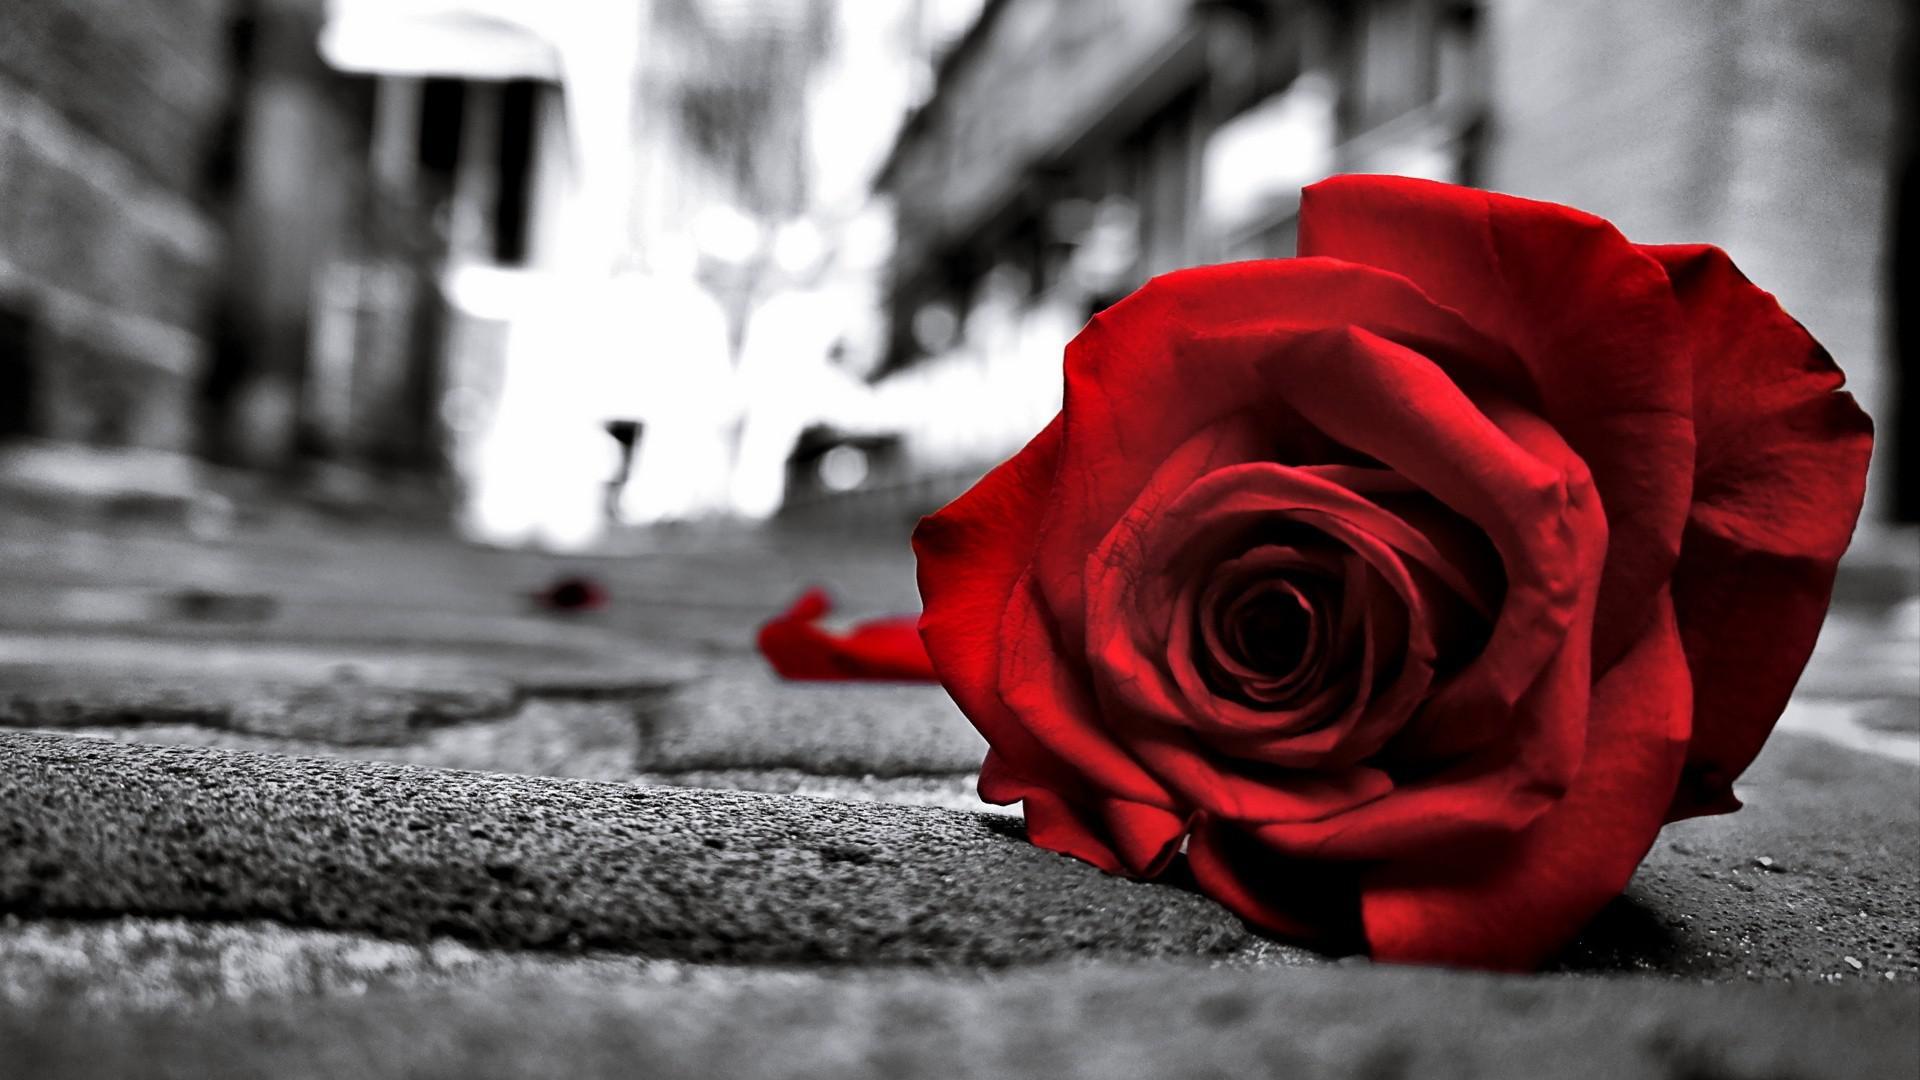 Very Sad Love Breakup Boys Girls Whatsapp DP Images Photo rh